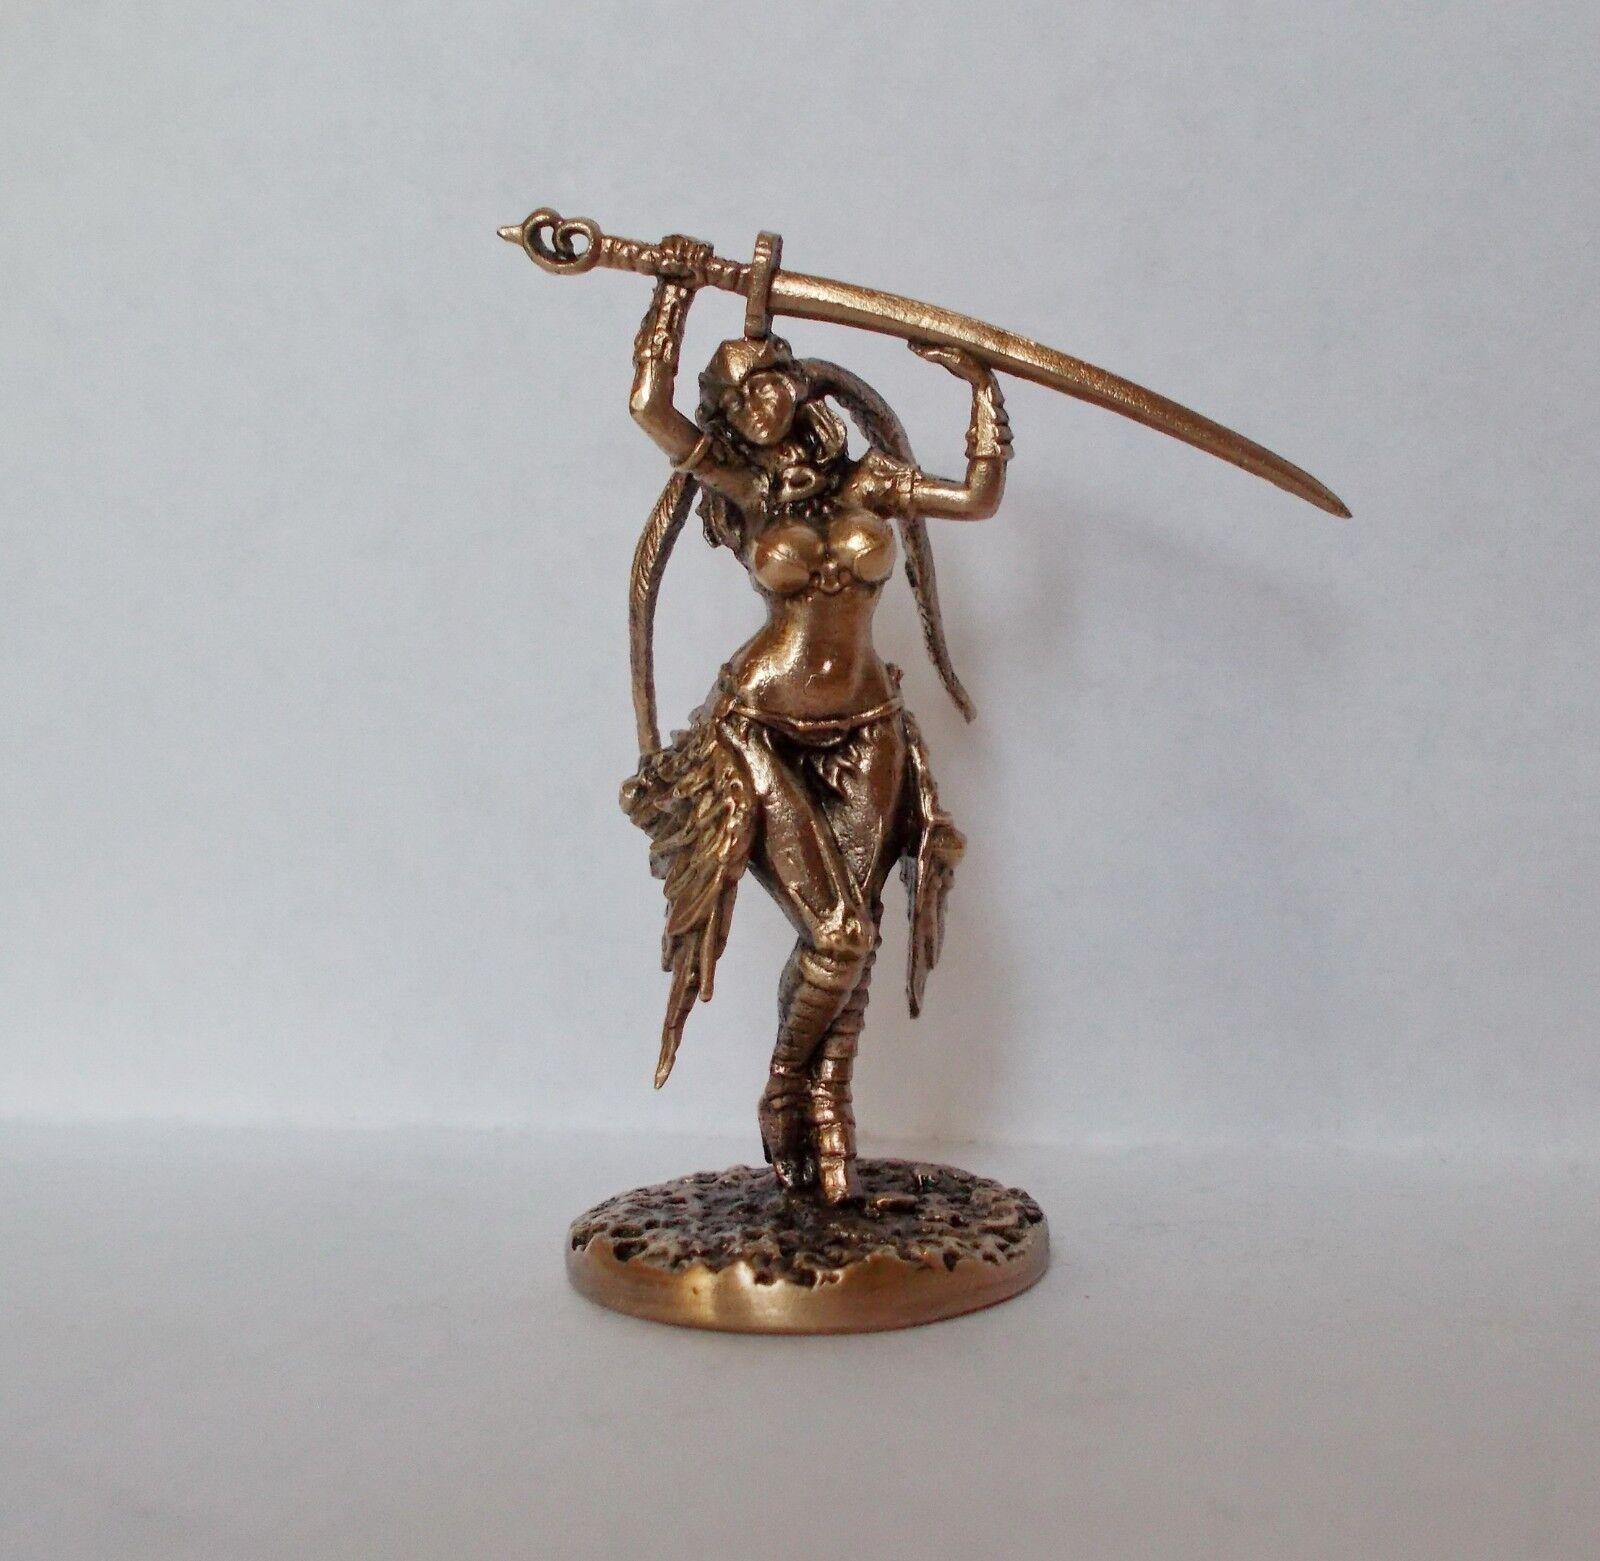 Reino de la muerte Pinup Phoenix Bailarina Bronce  DK14 de conversión (Metal)